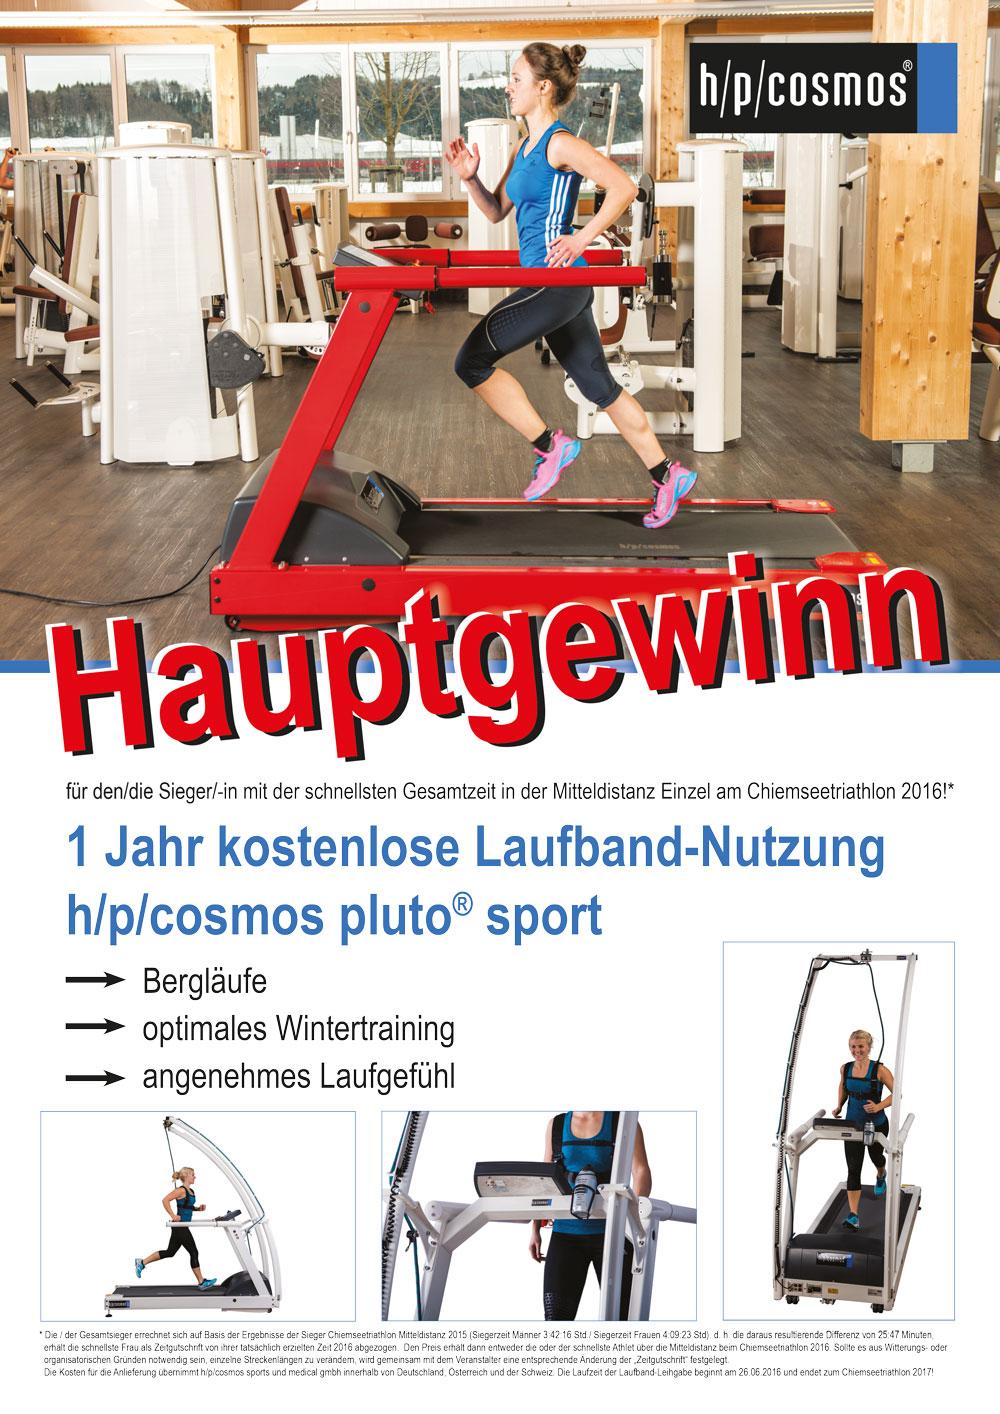 20160610_cst_hauptgewinn_pluto_plakat